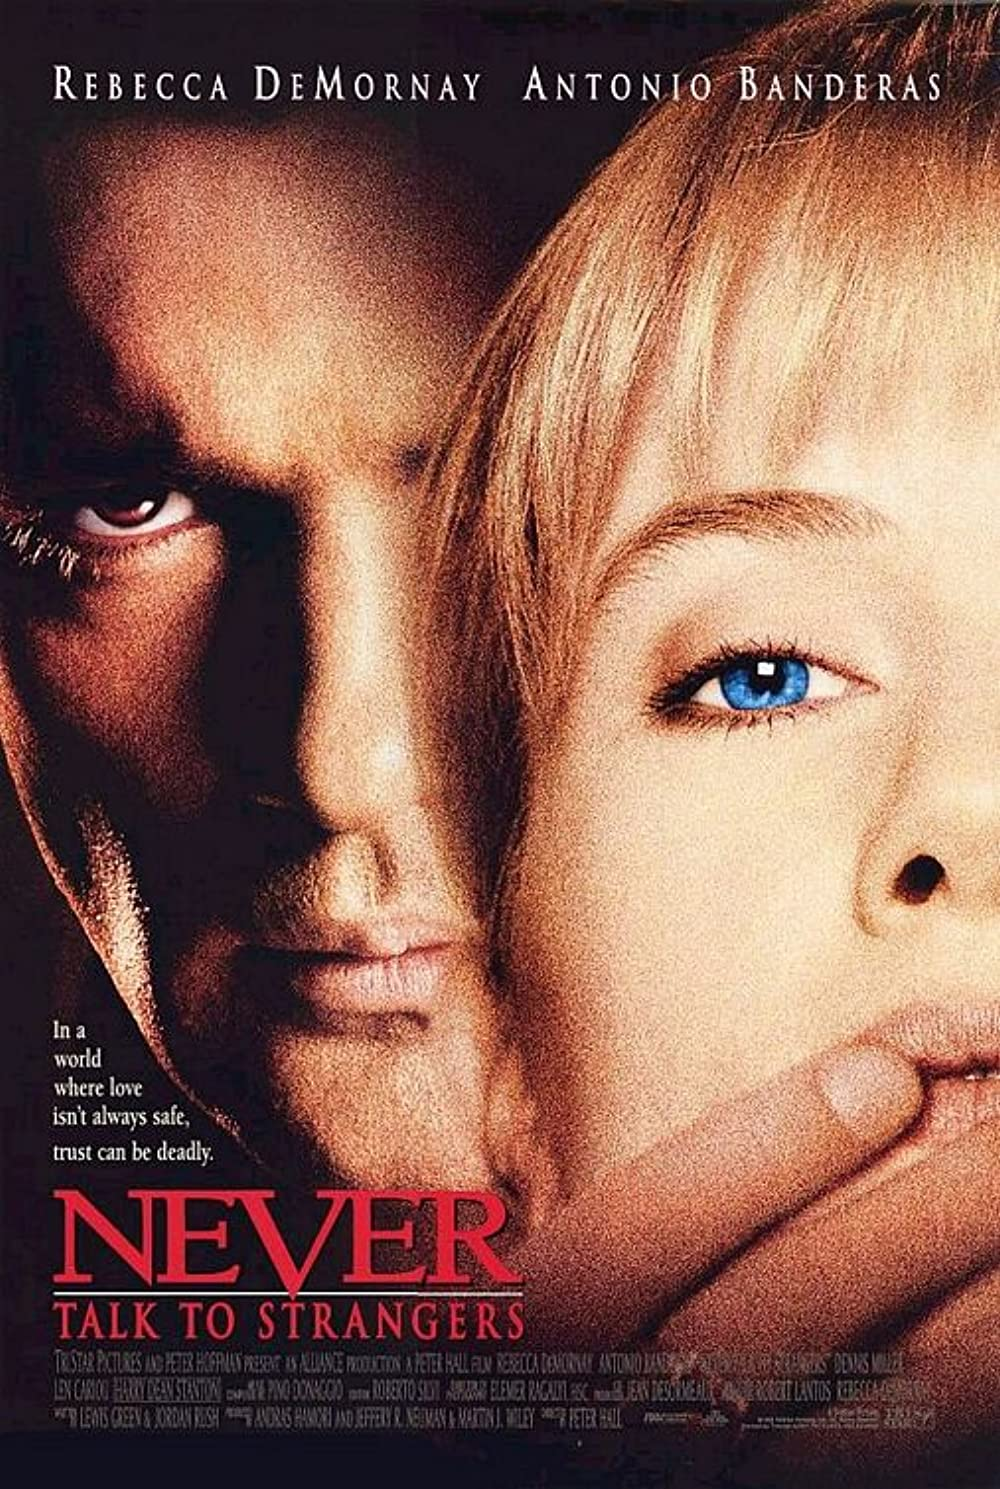 Poster for Never Talk to Strangers